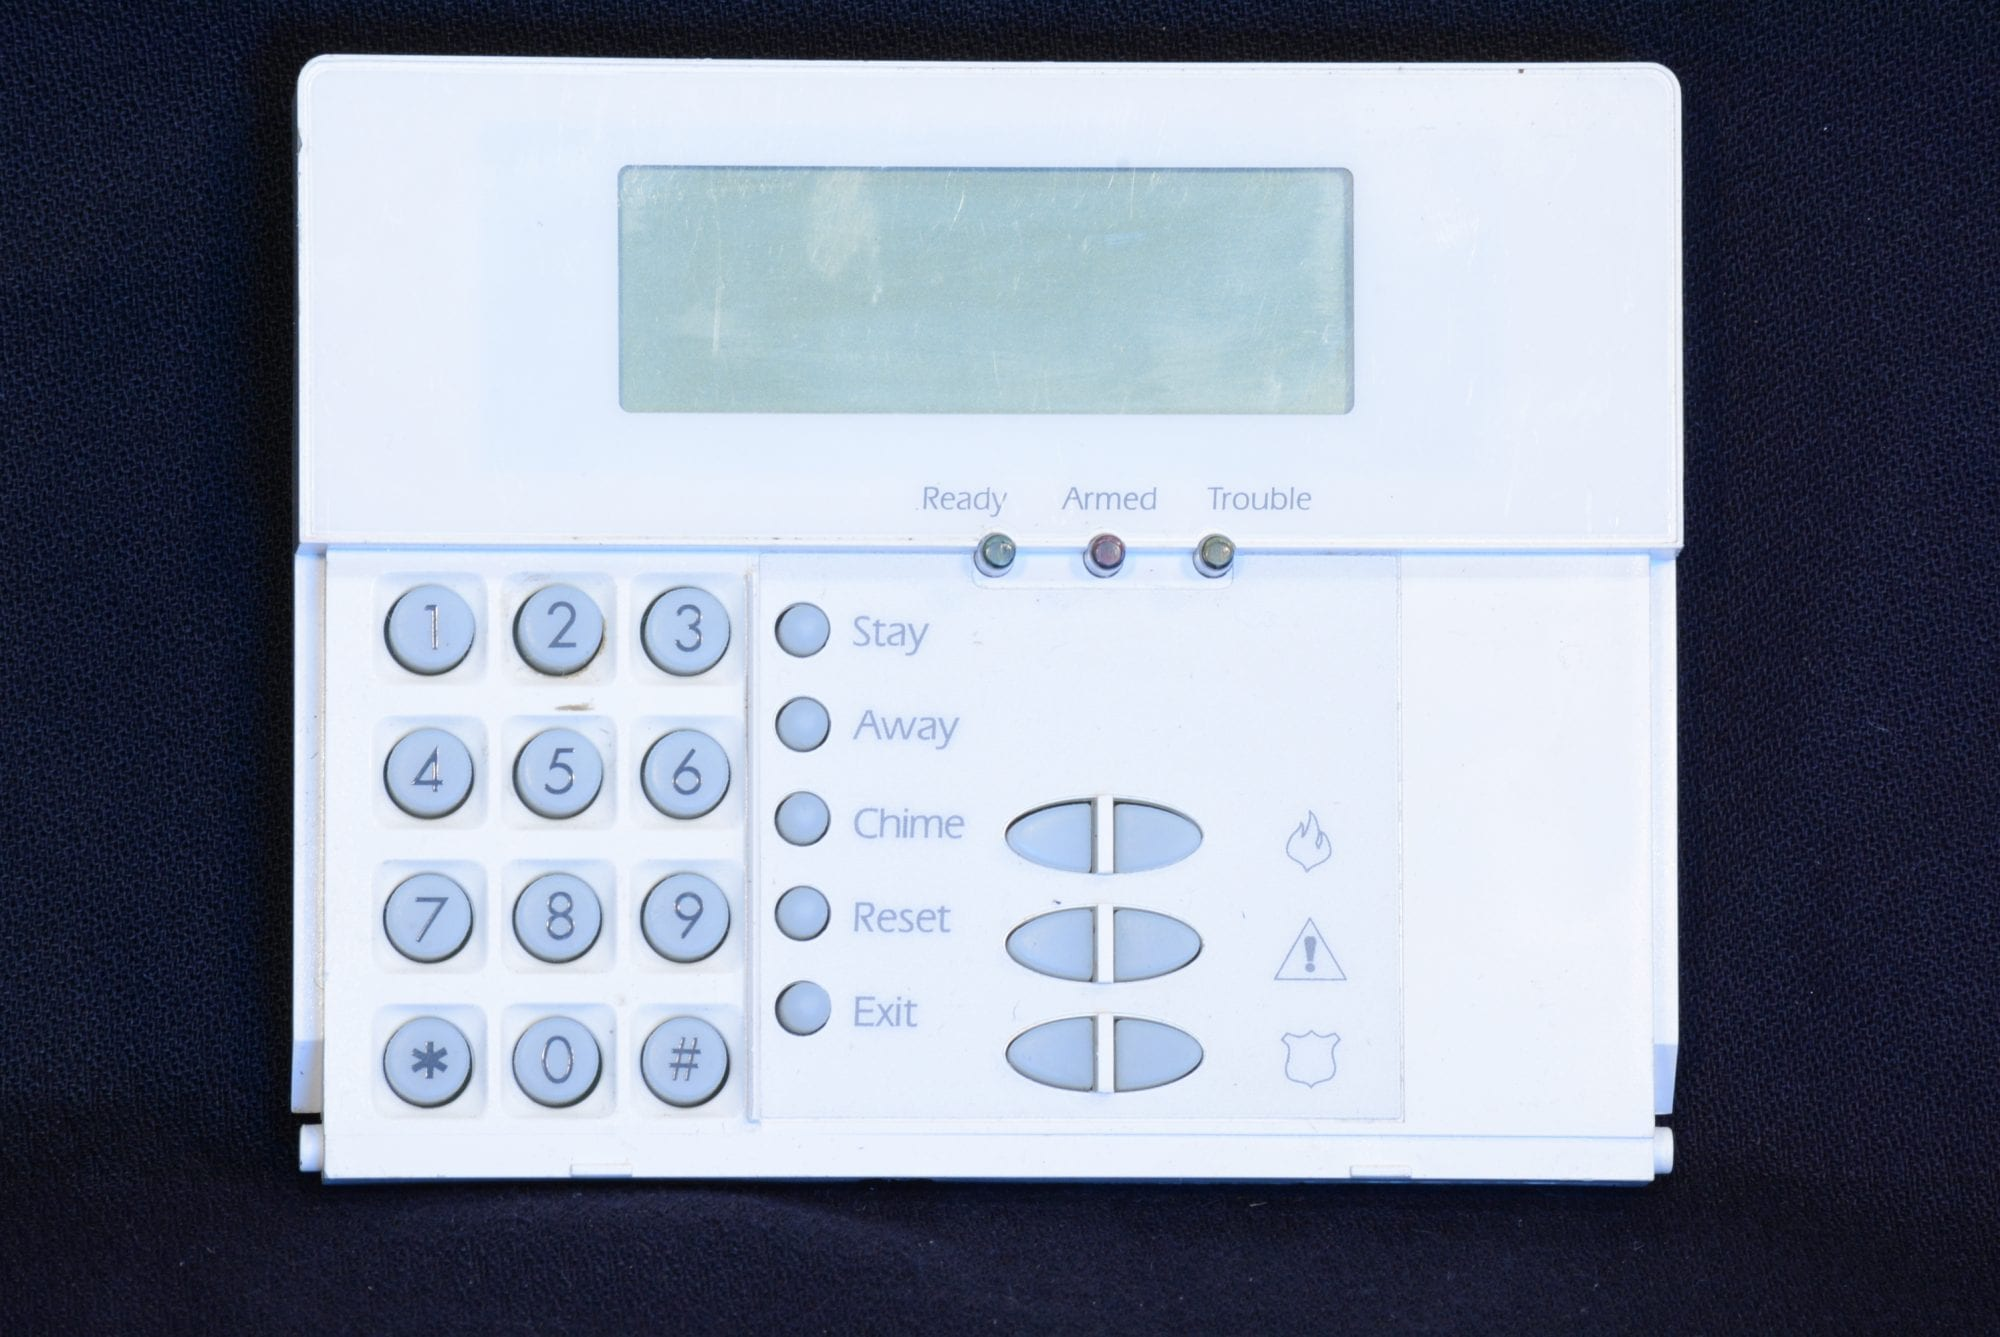 DSC LCD Keypad - Wayne Alarm Systems